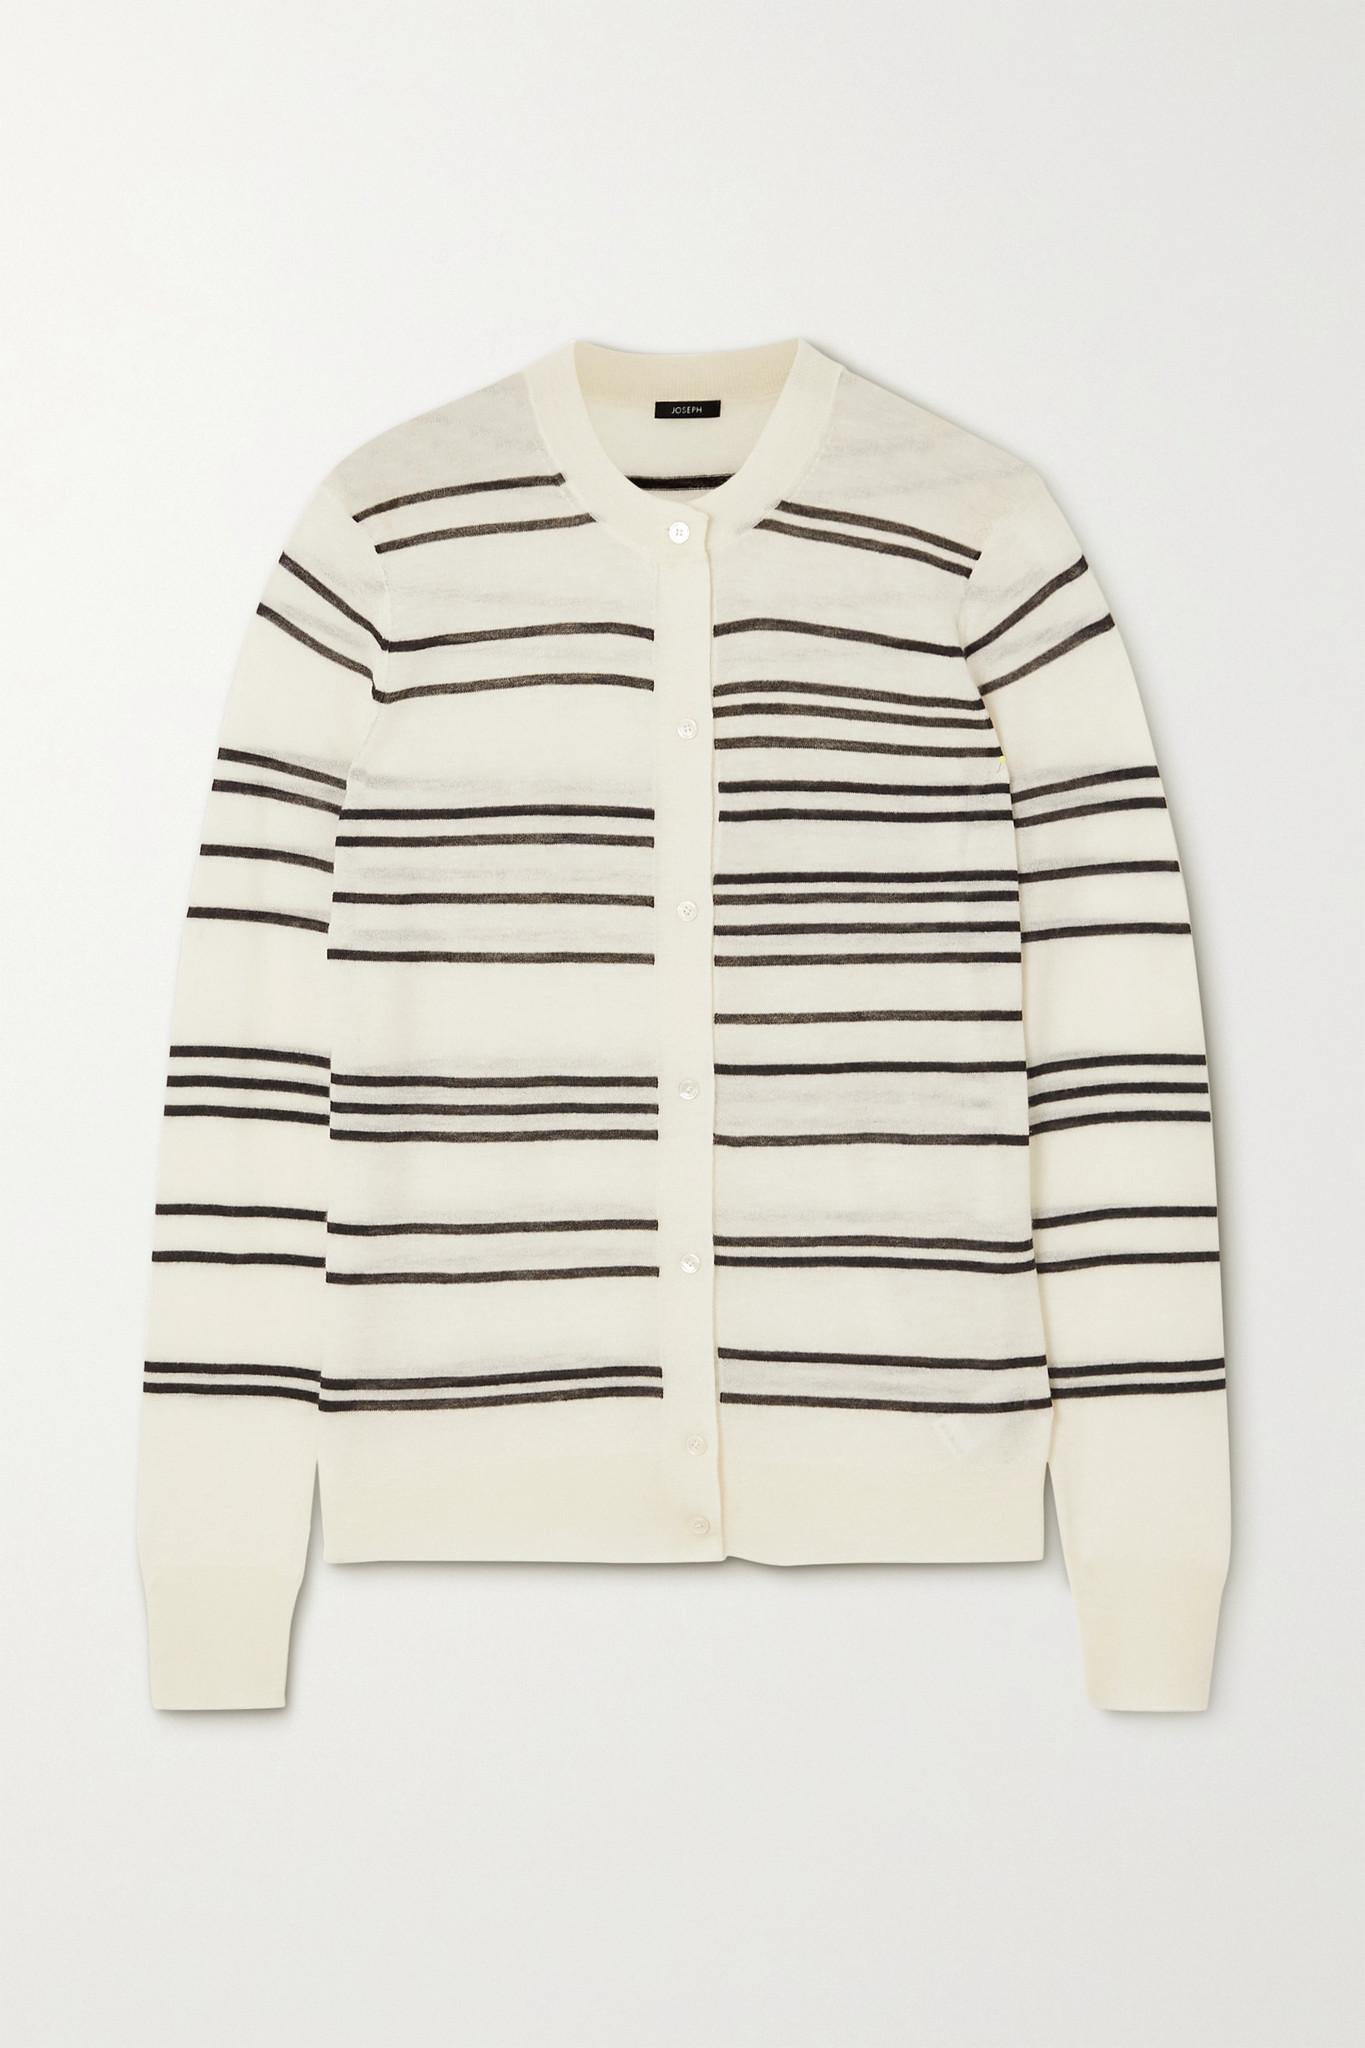 JOSEPH - 条纹羊绒开襟衫 - 象牙色 - x small